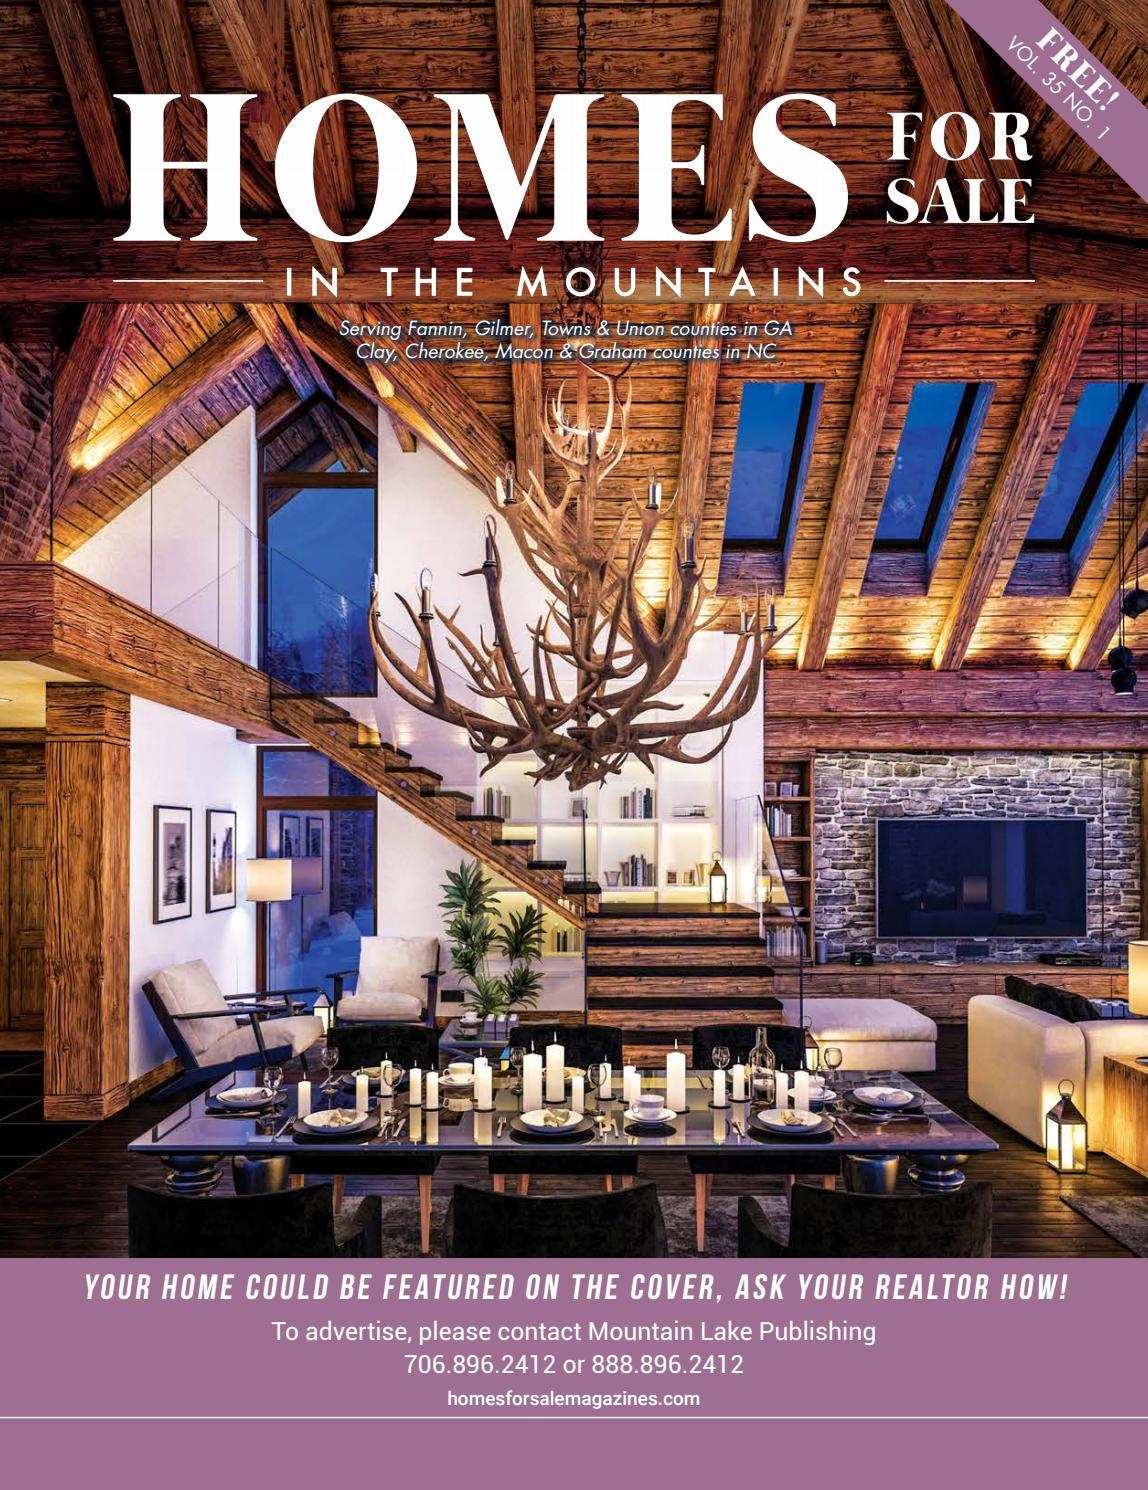 Homes For Sale Magazine Z1_35 1 by mtnlakepub - issuu